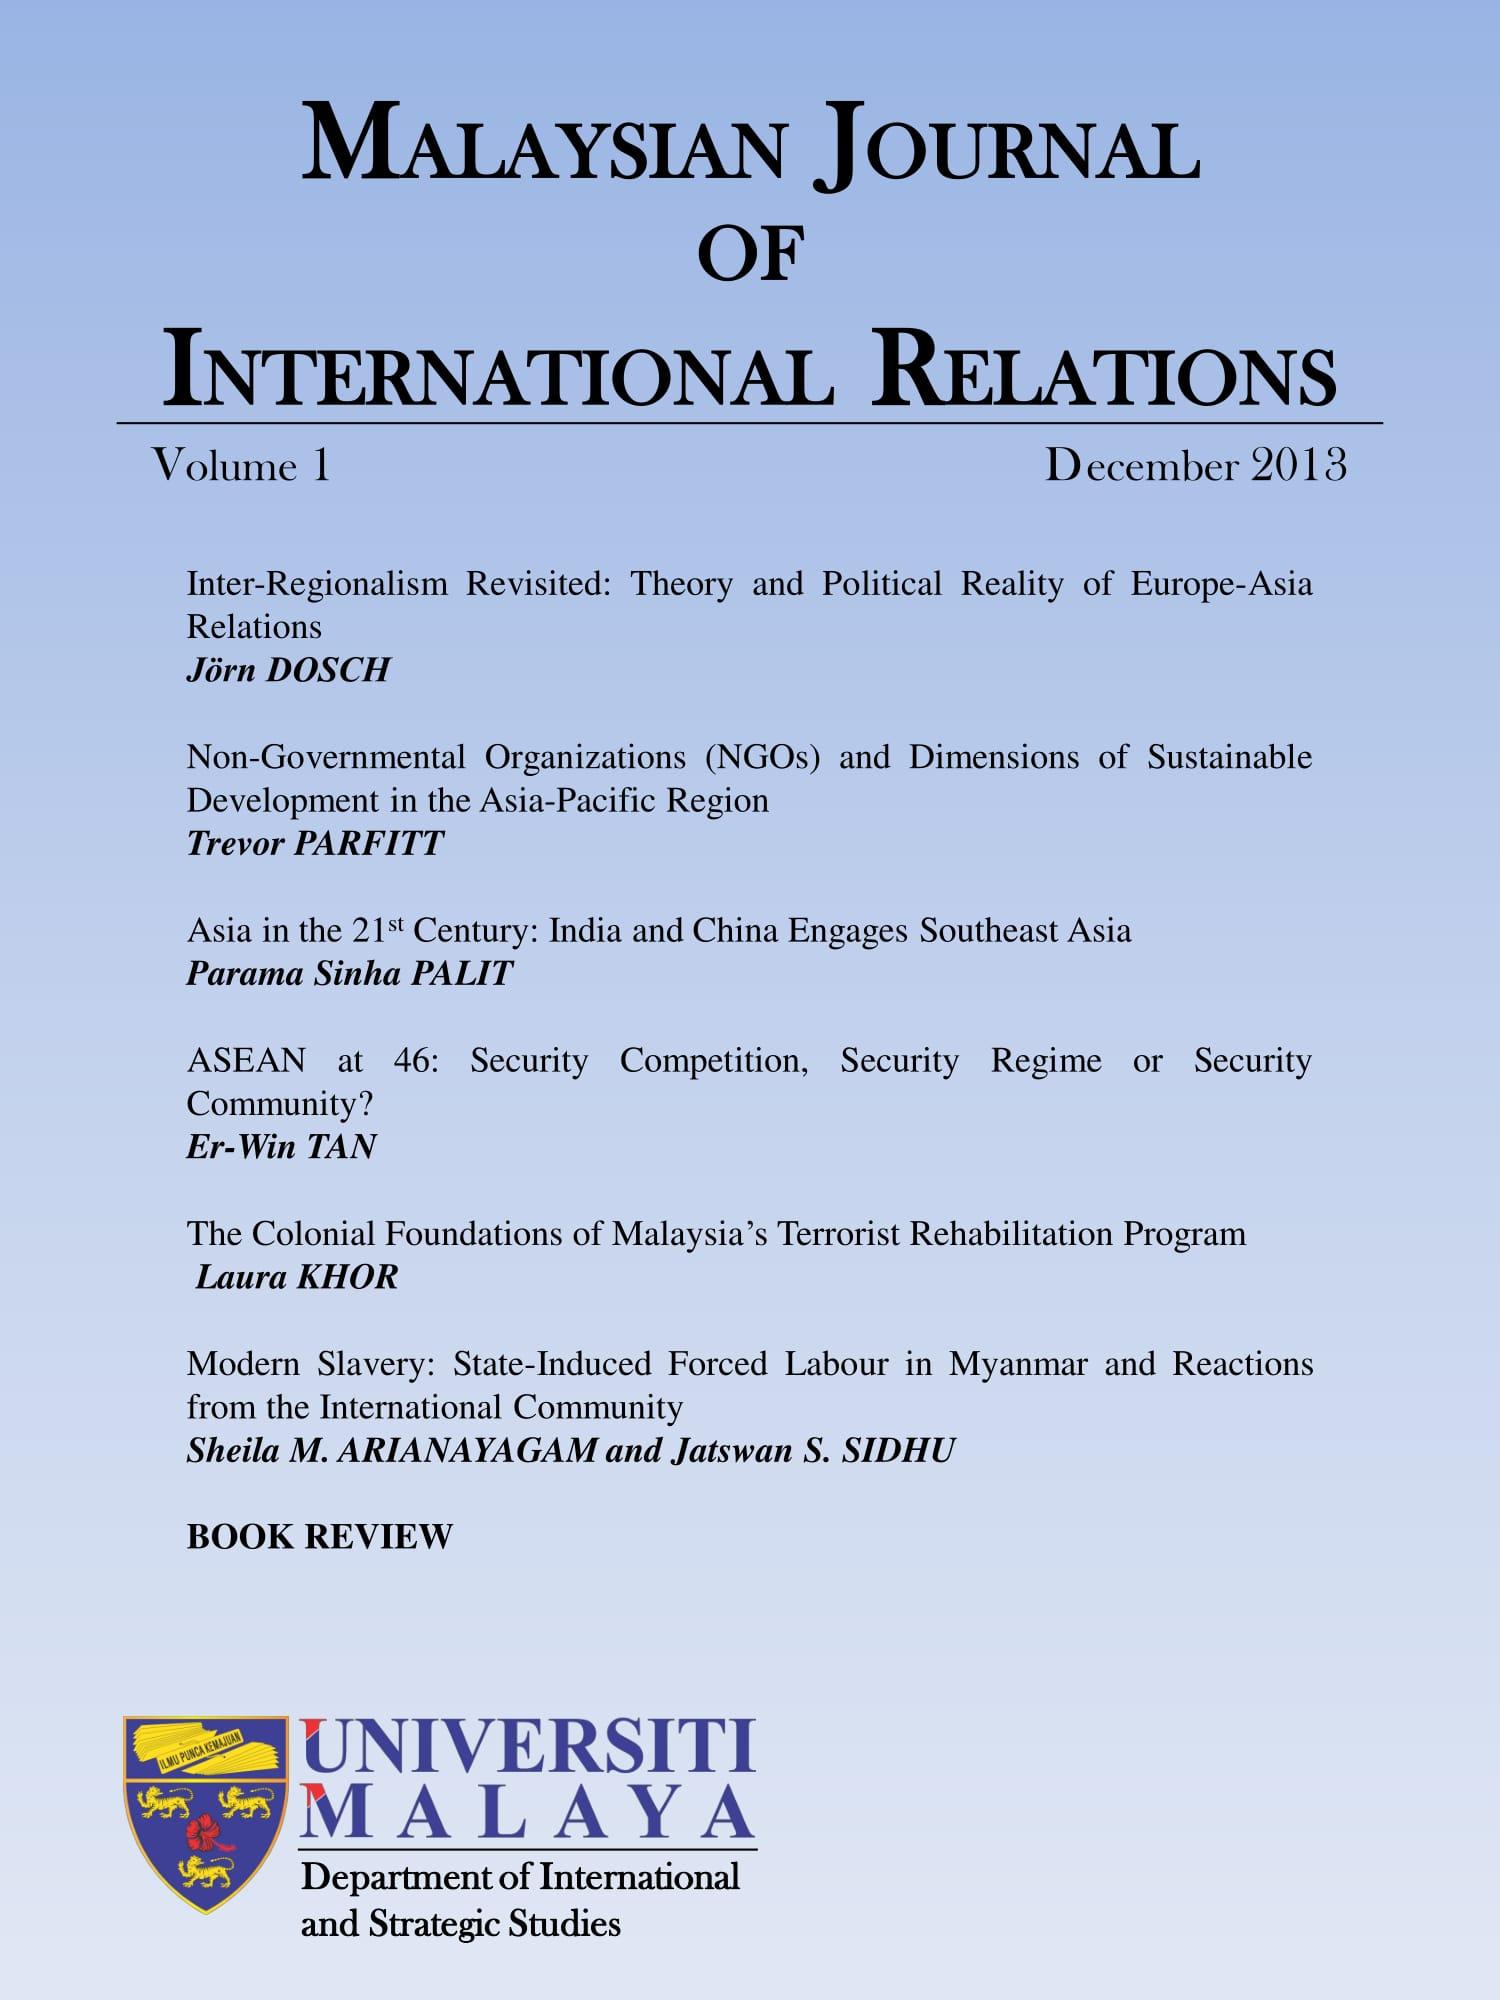 Vol 1 (2013): Vol 1, December 2013 | MJIR | Malaysian Journal of International  Relations